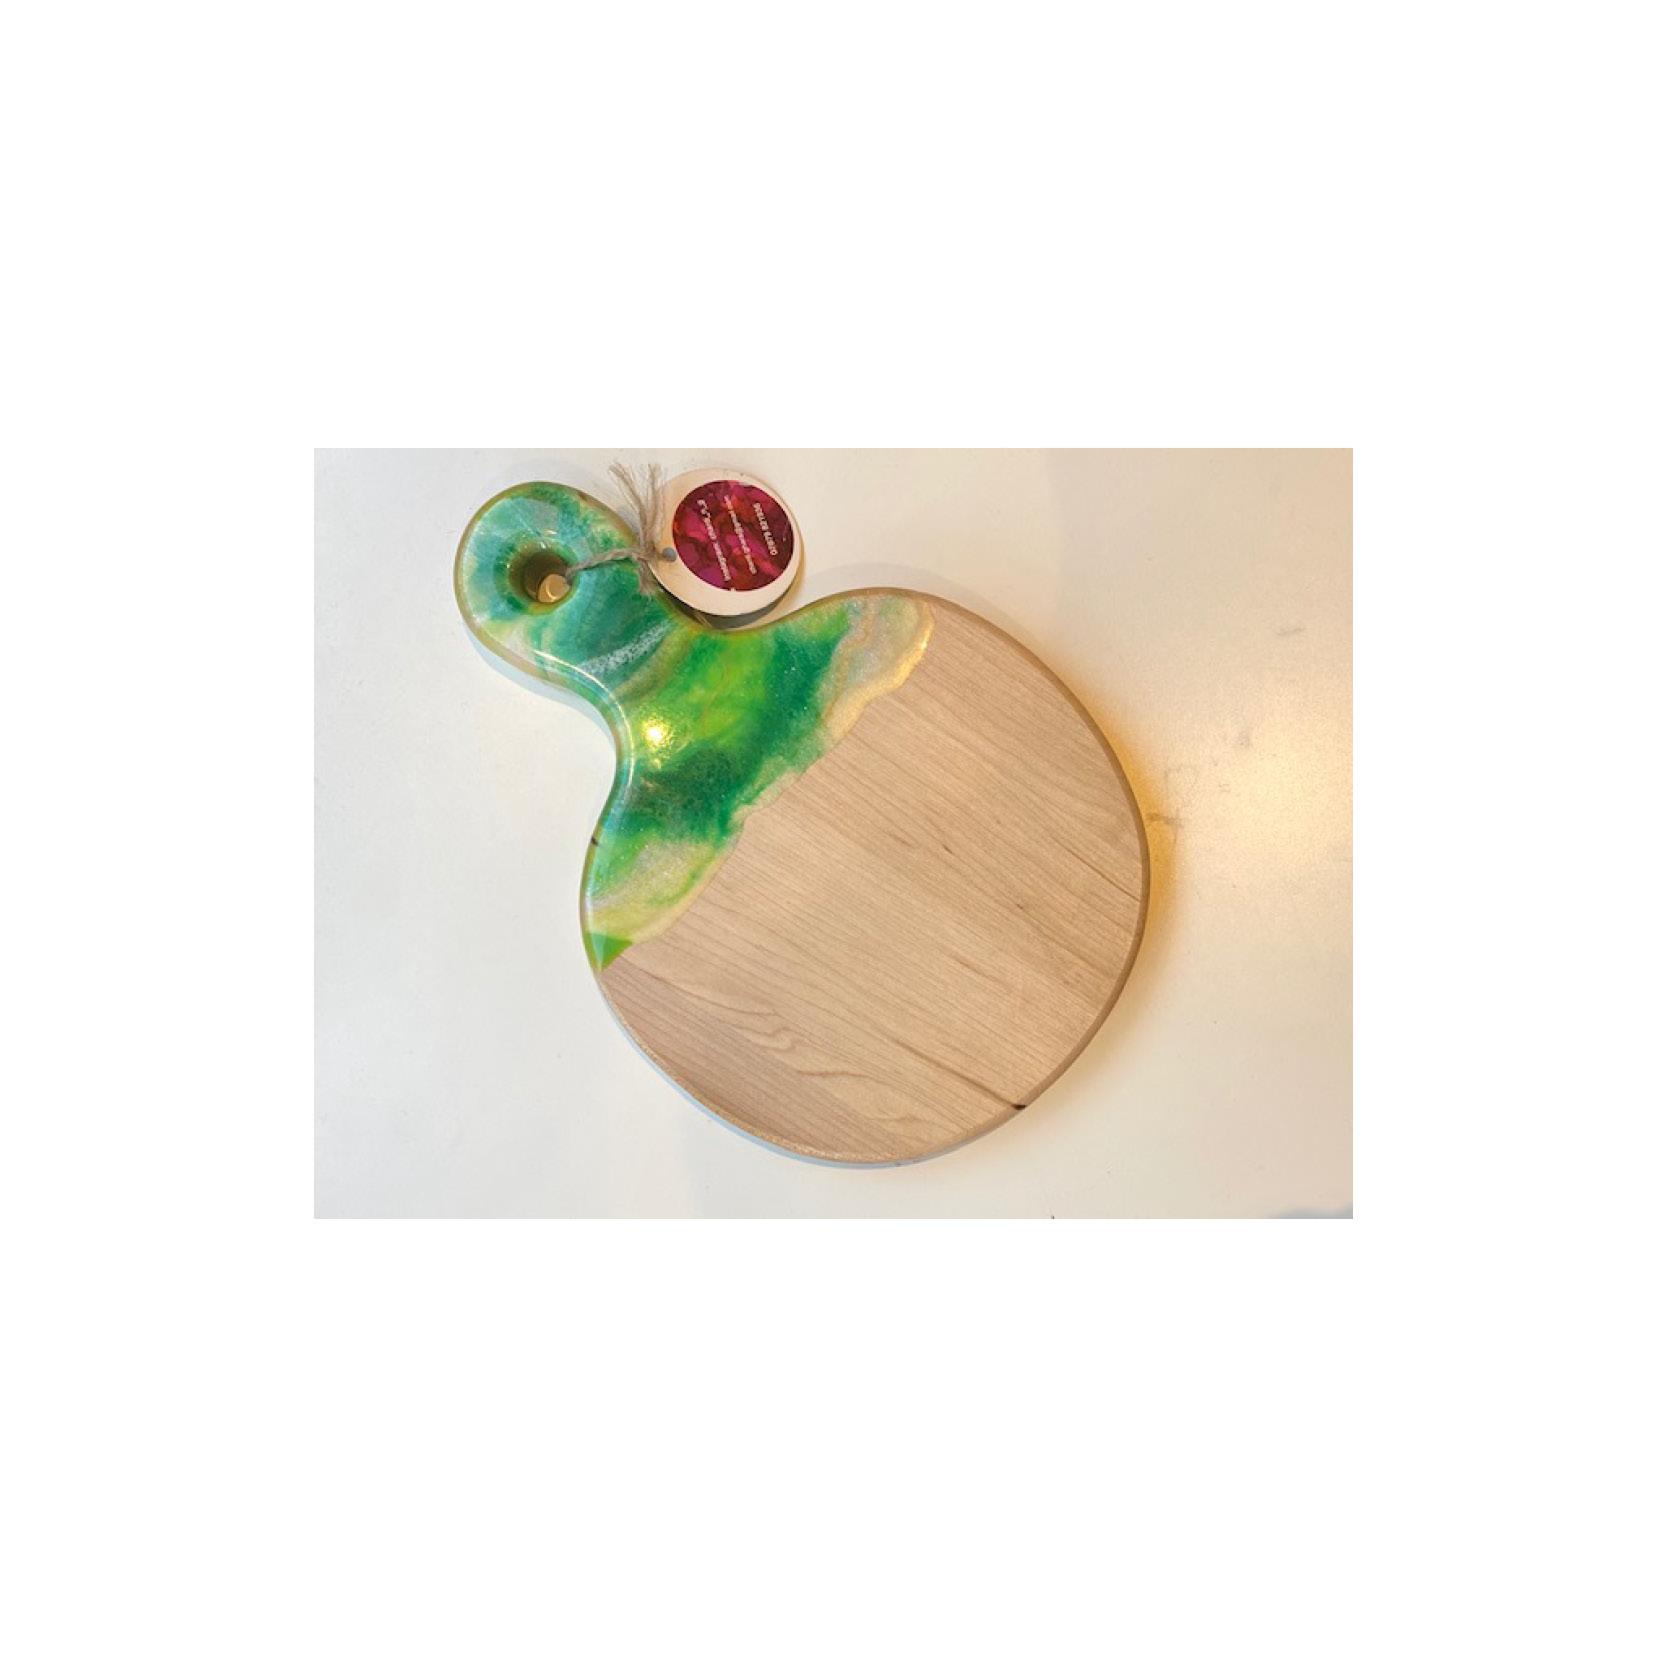 Chantal - Small round resin board